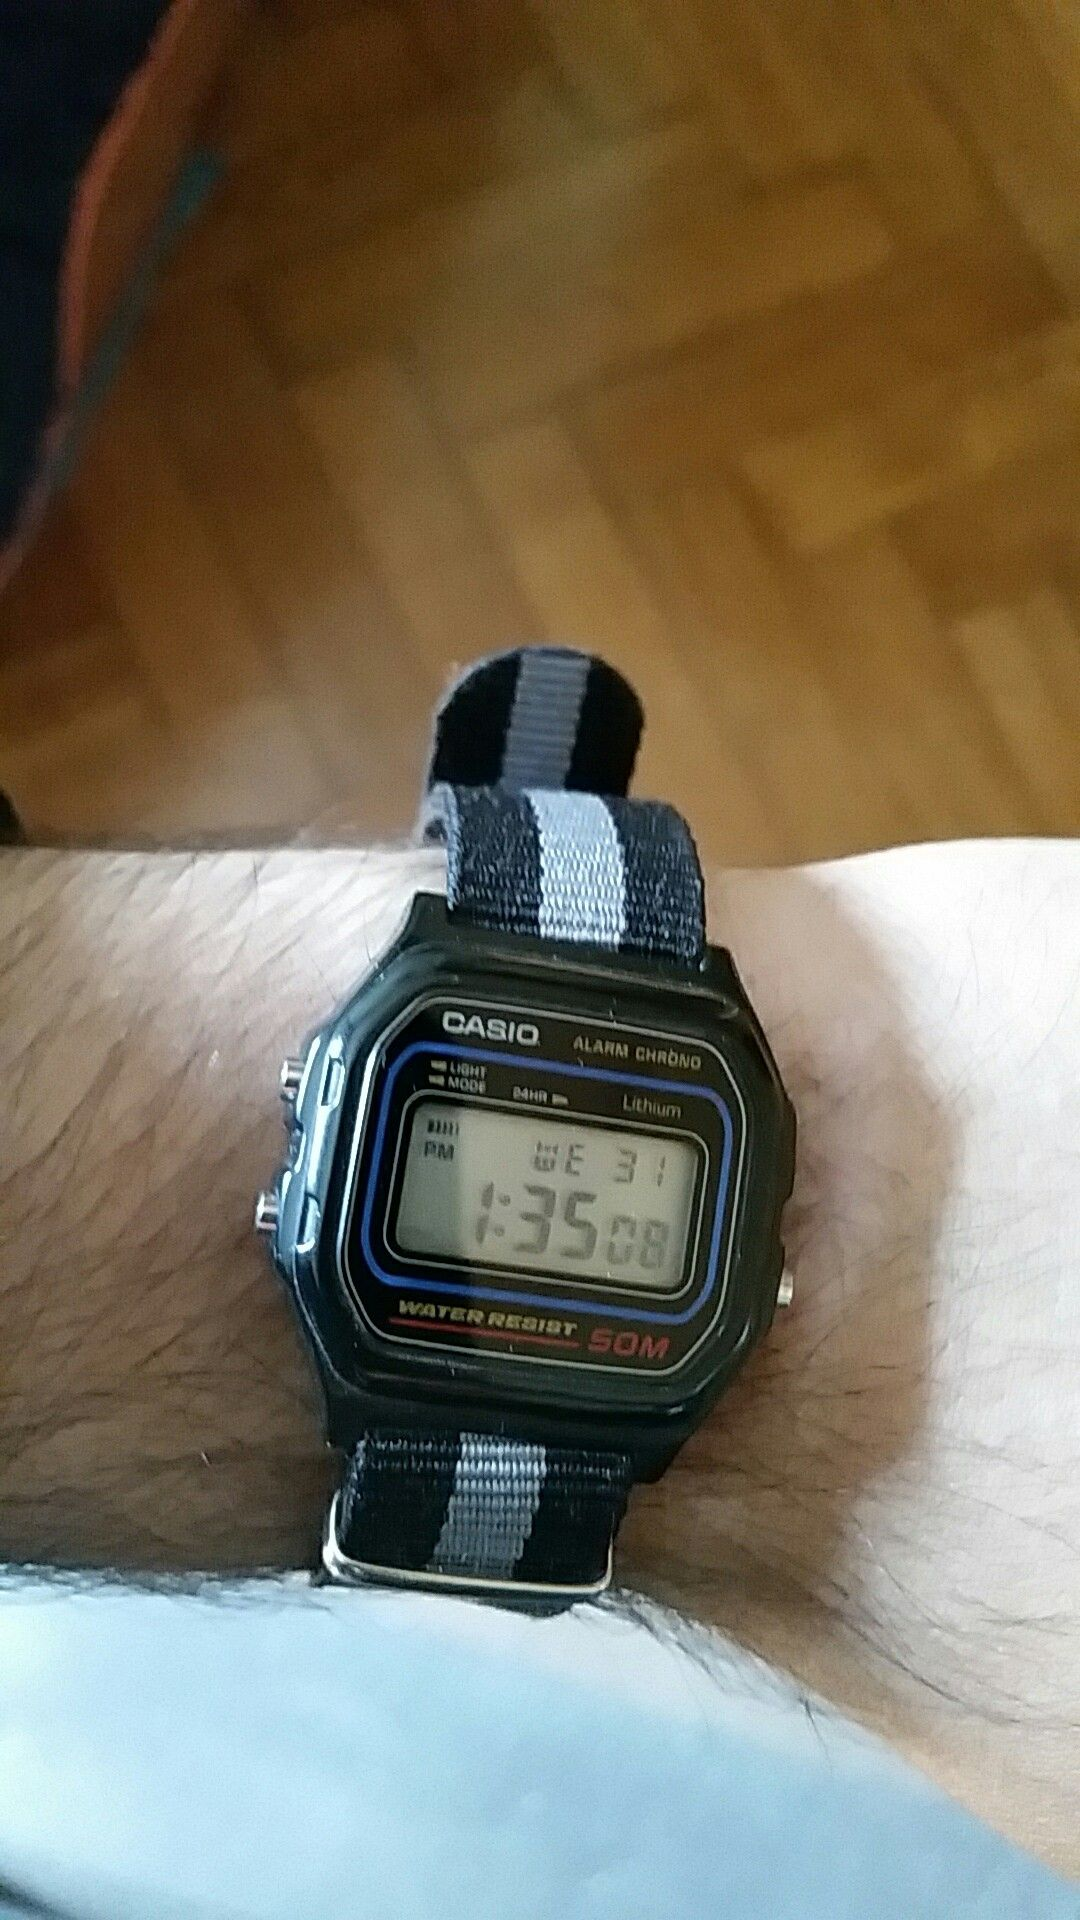 543e4ecd30 Casio w59 with a 18mm NATO strap   watches   Reloj, Pensamientos, Ropa